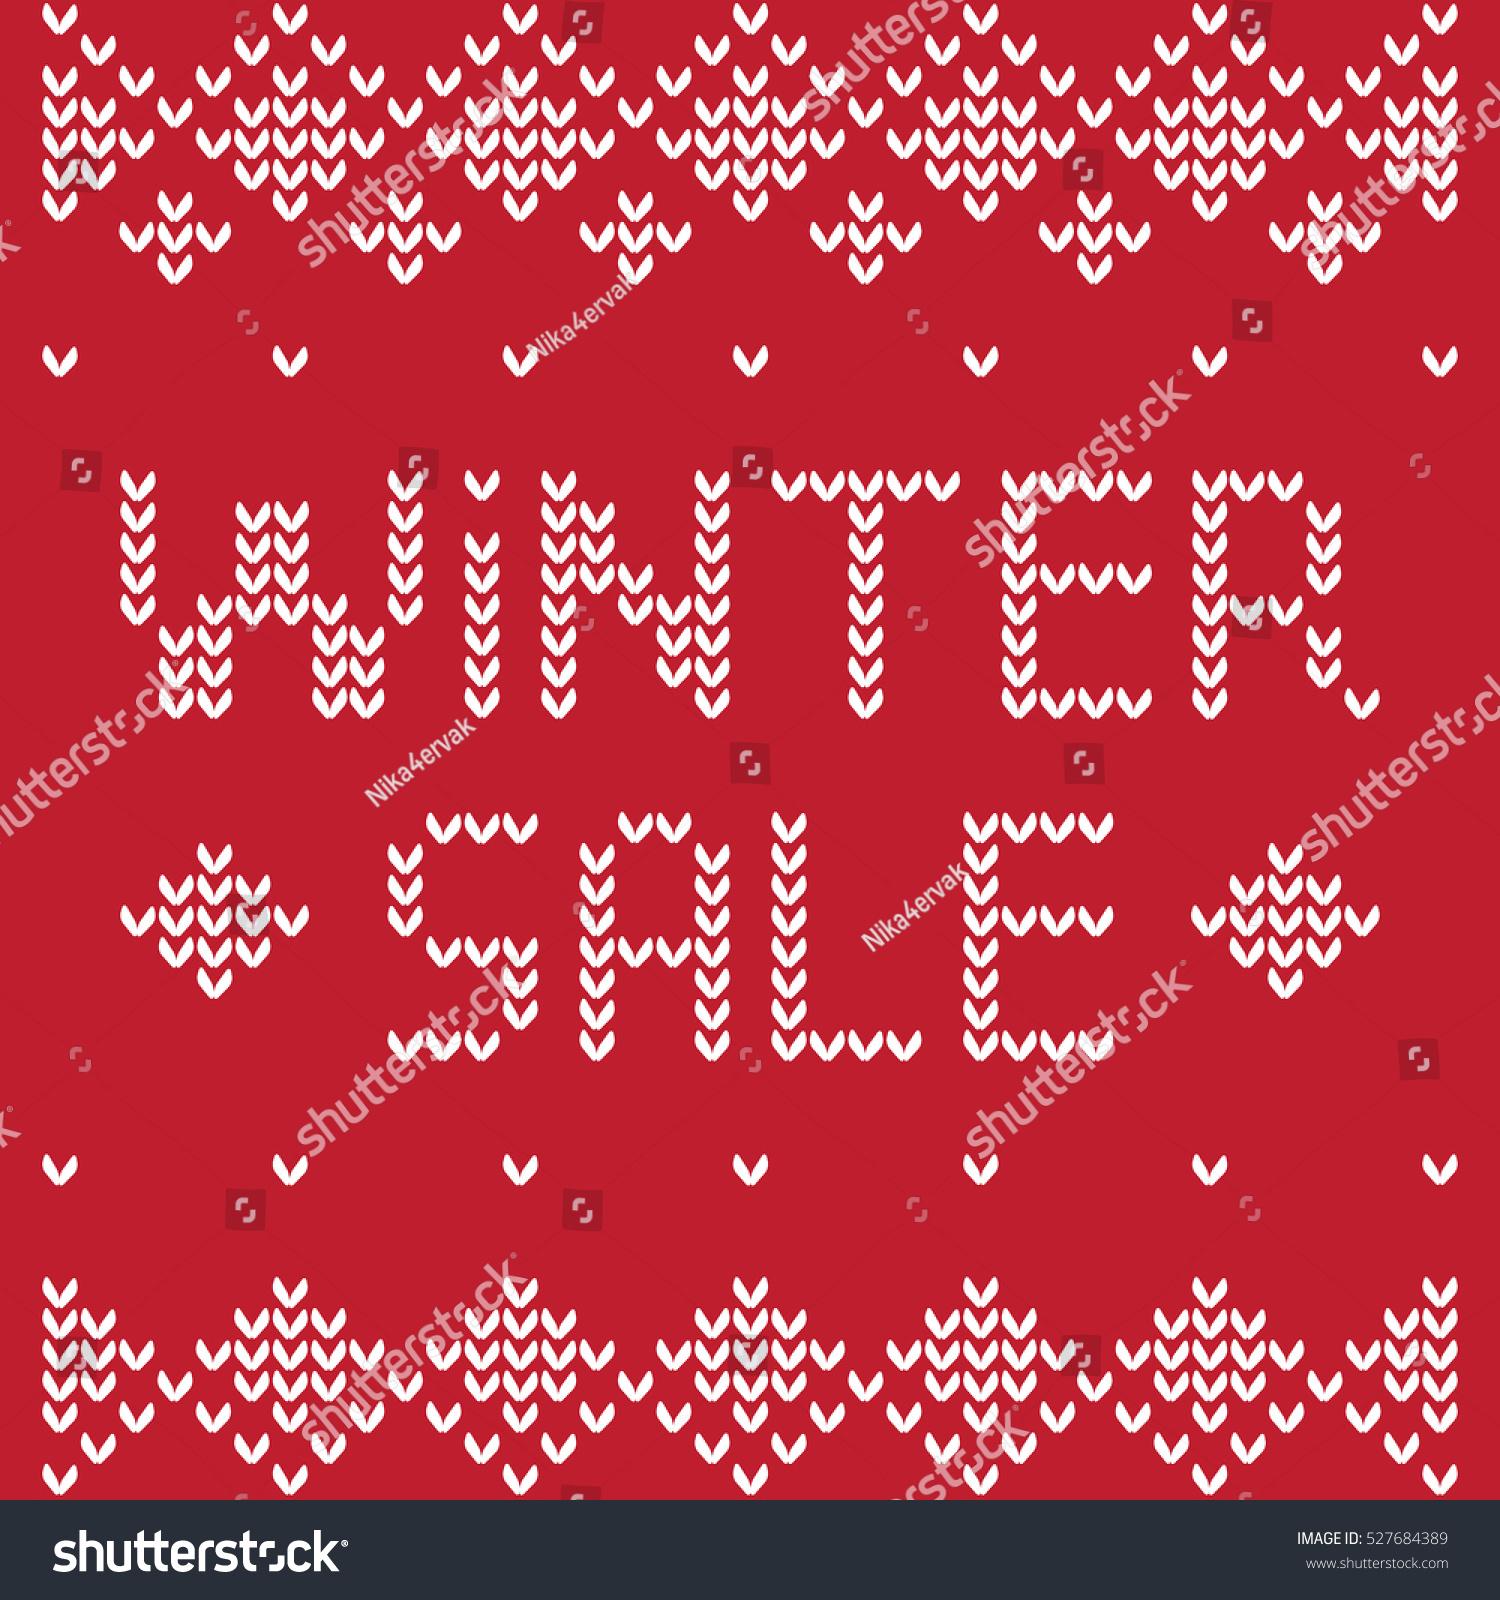 Knitting Pattern On Sweater Words Winter Stock Photo (Photo, Vector ...